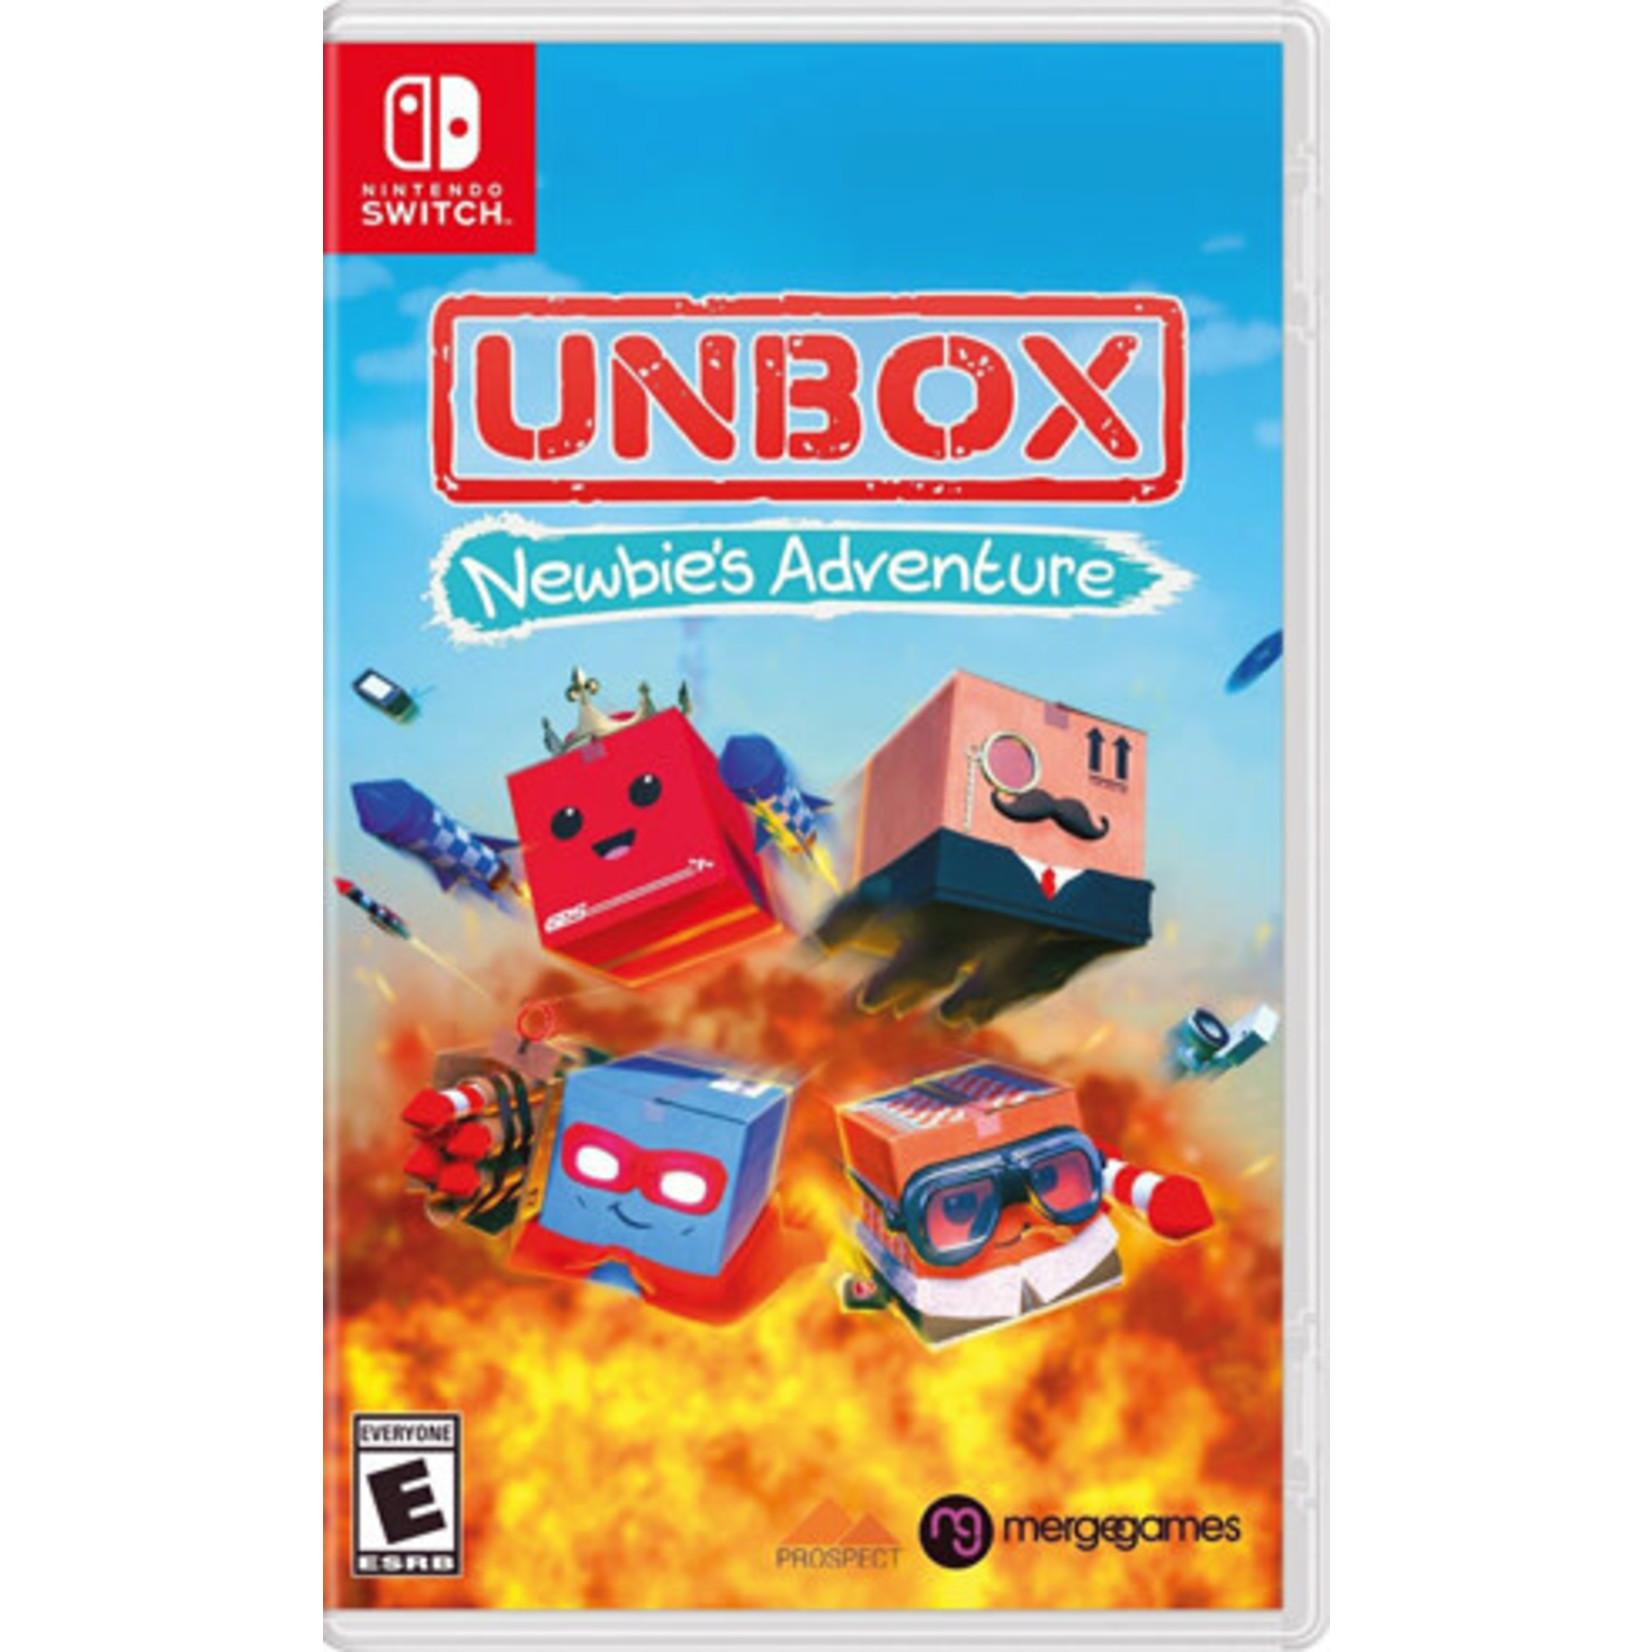 Switch-Unbox:Newbie's Adventure